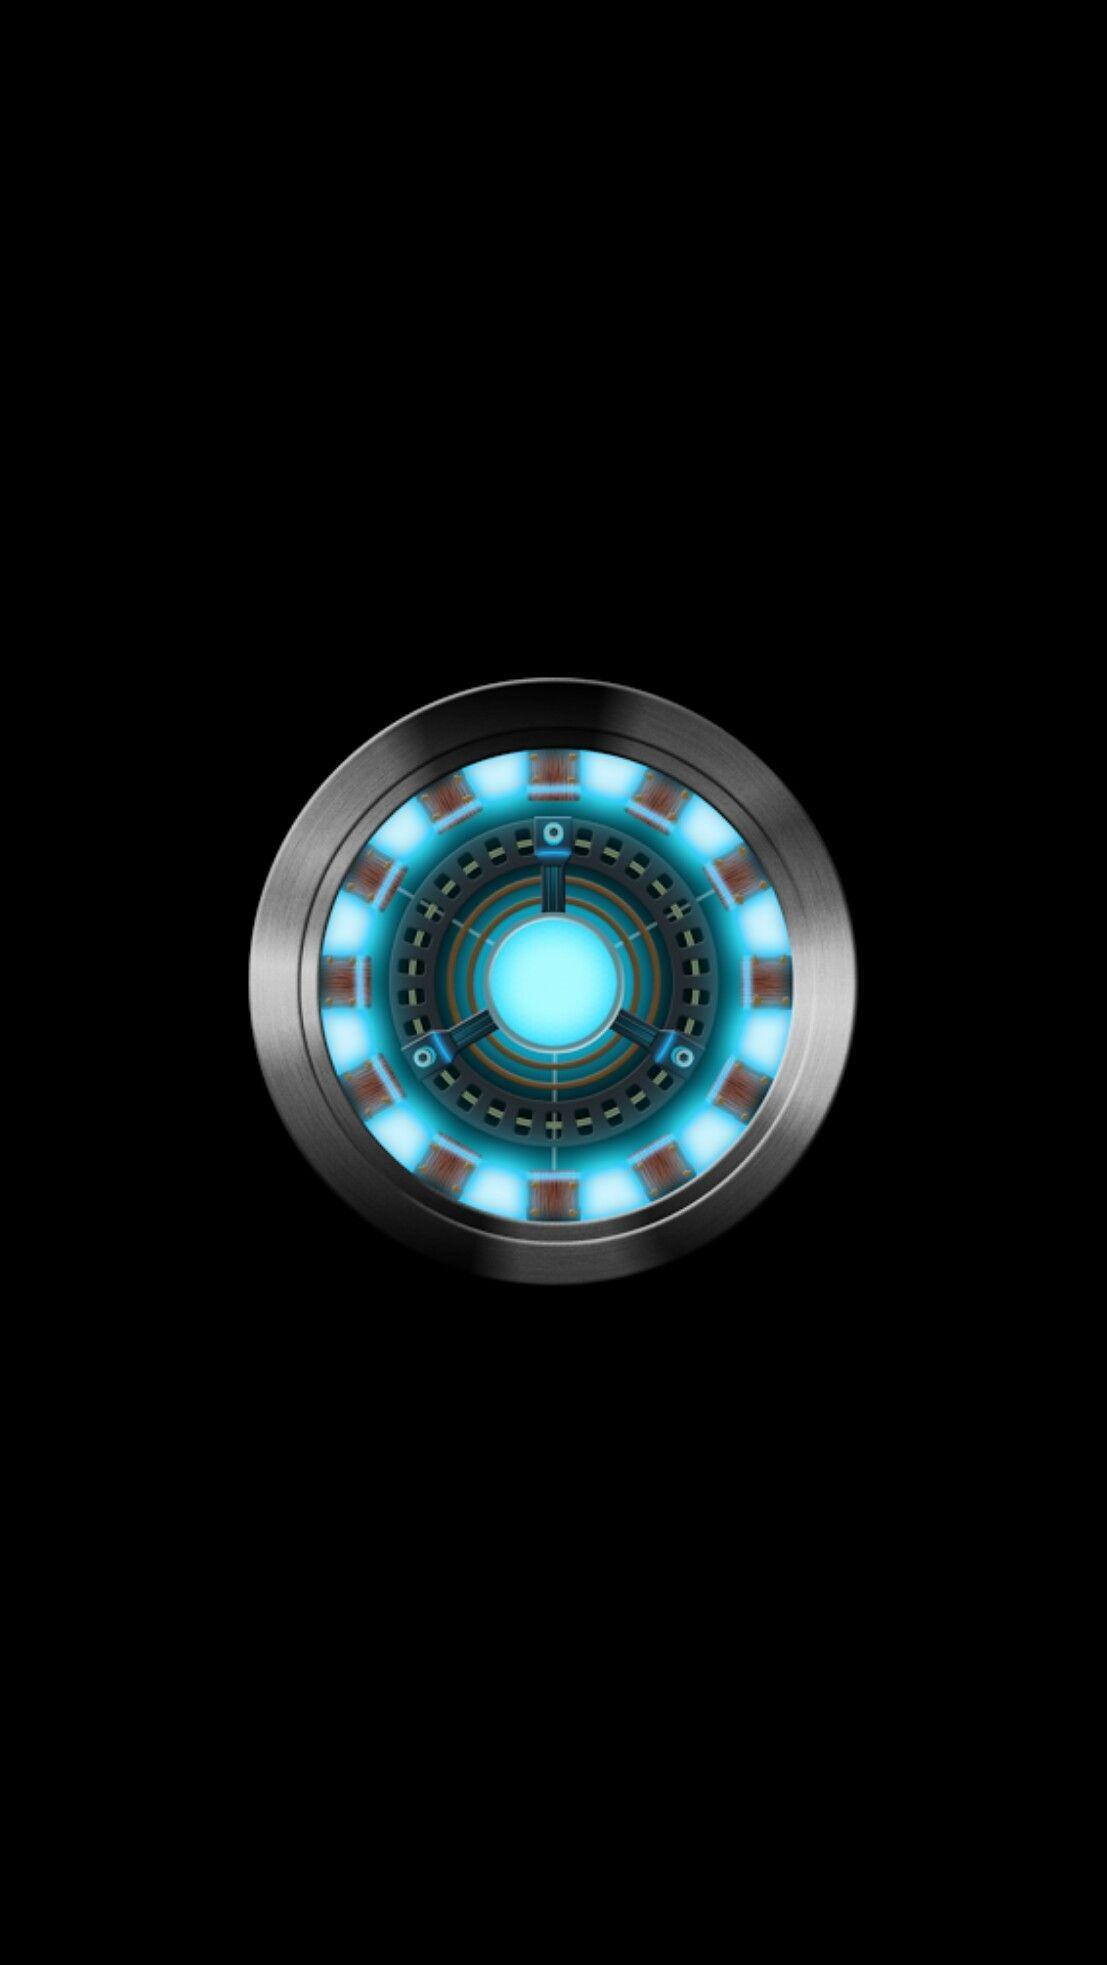 91 Iron Man Arc Reactor Live Wallpaper